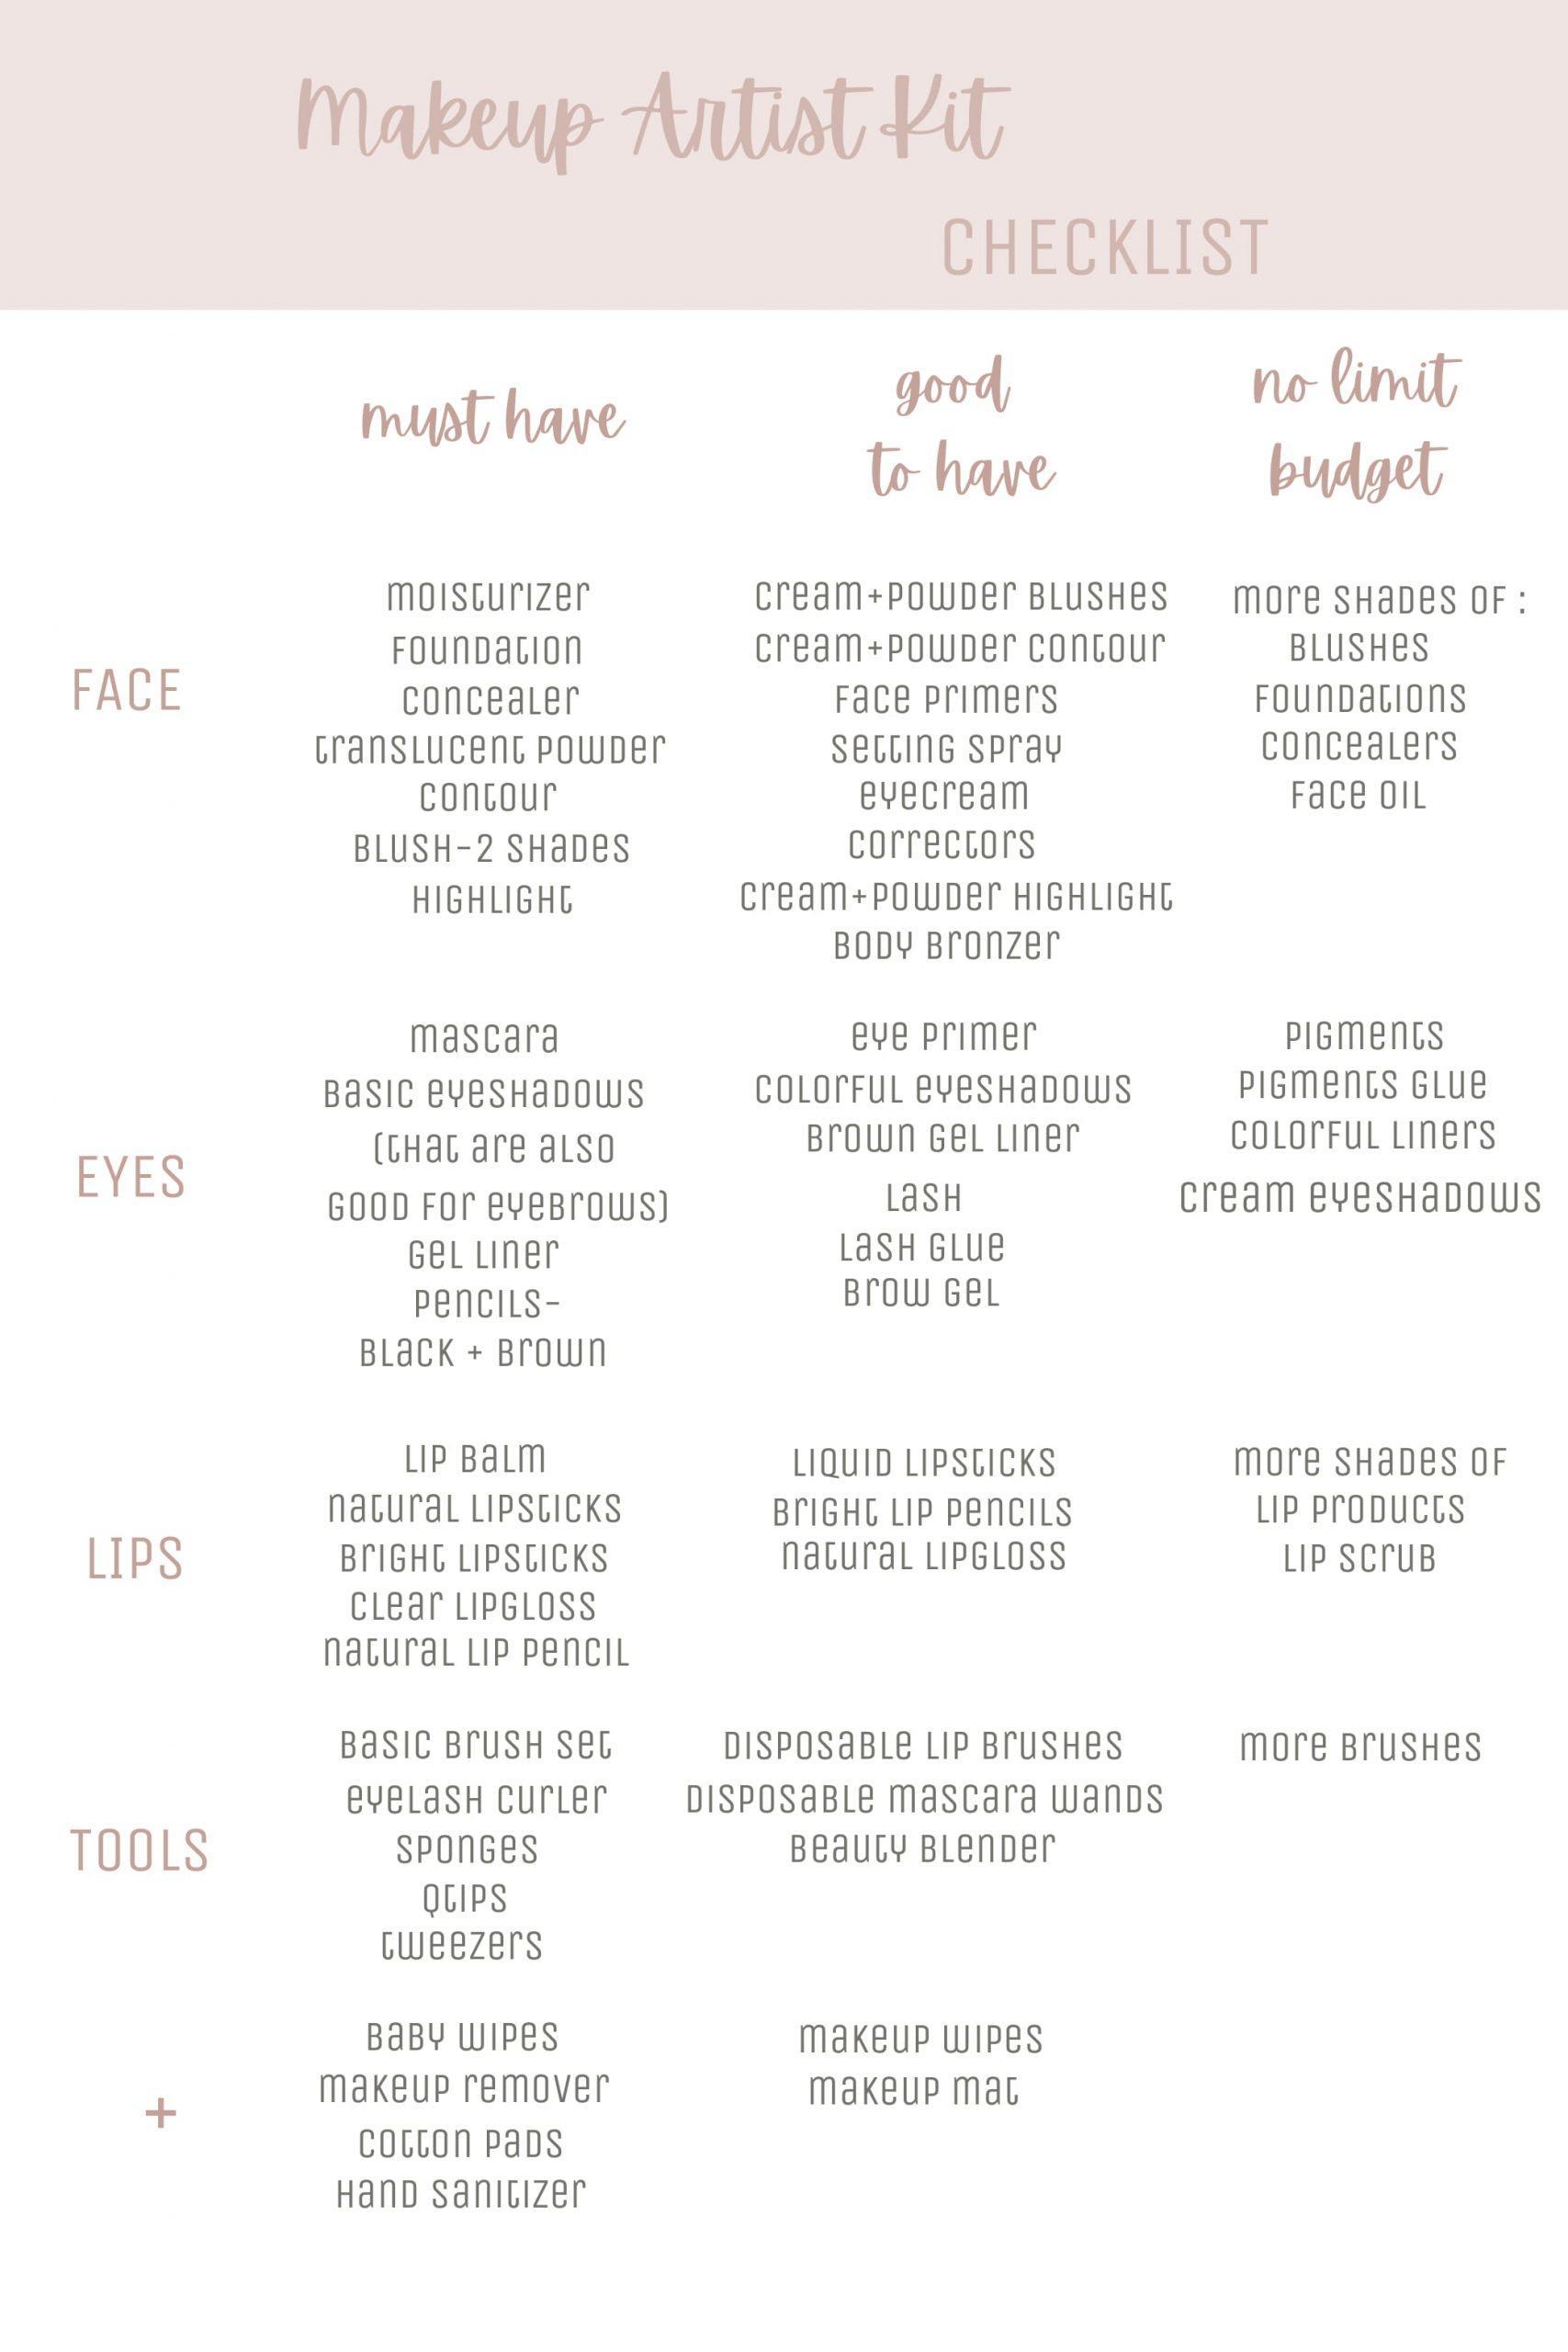 Makeup Artist Kit Checklist